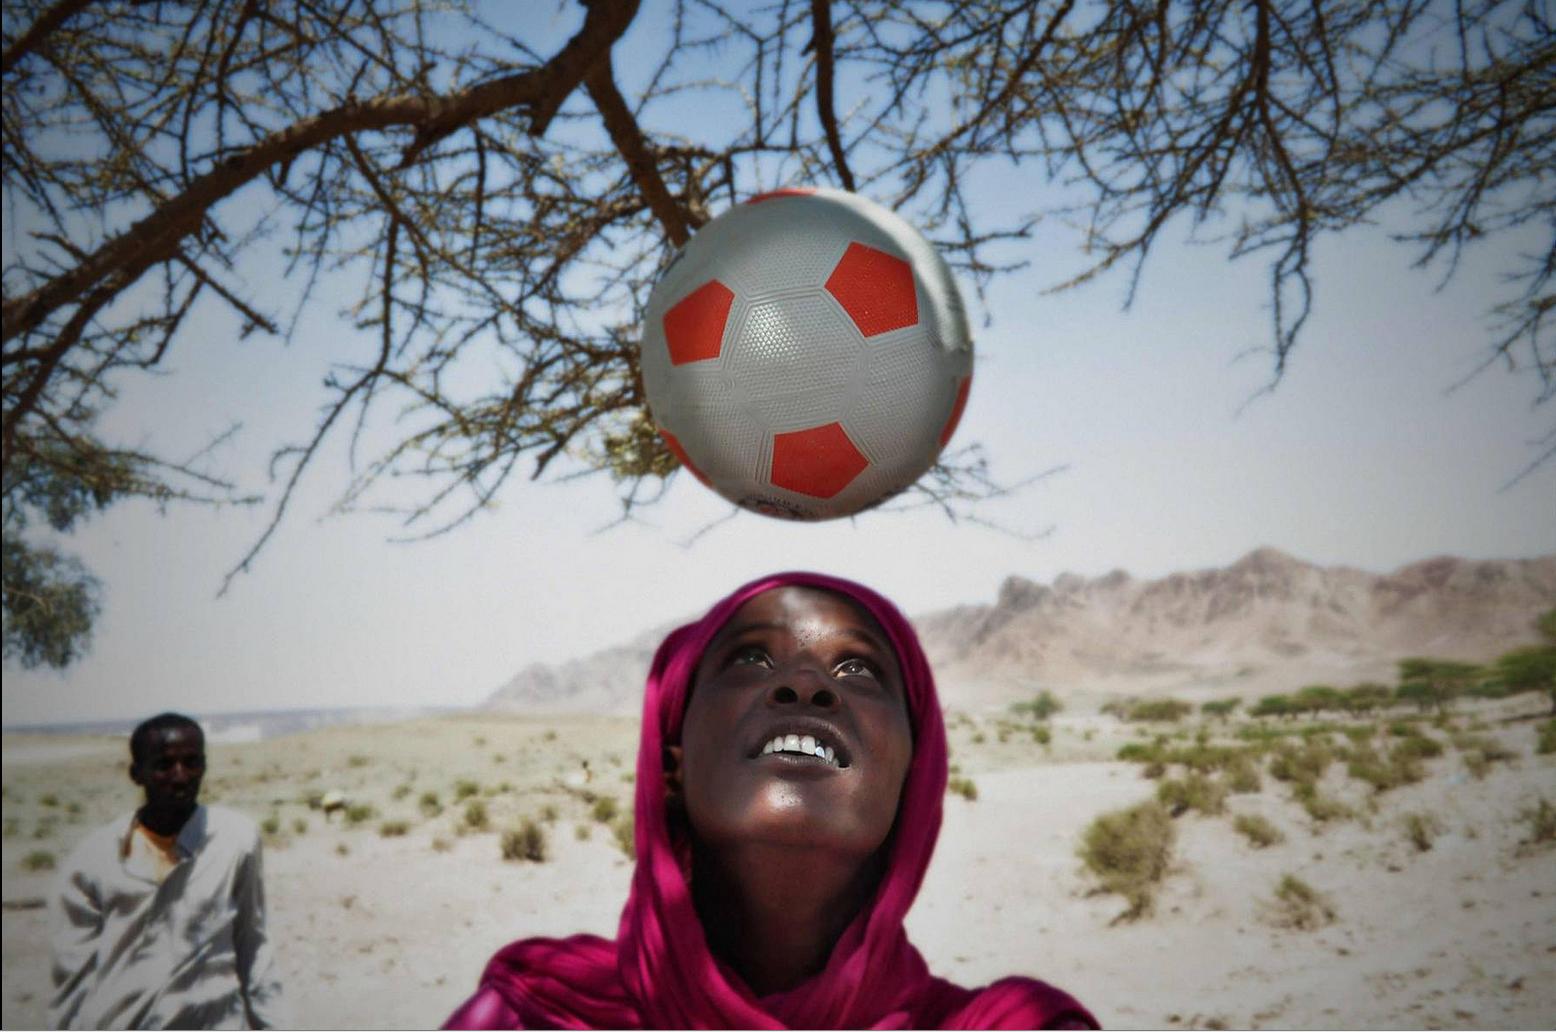 How Africa plays football